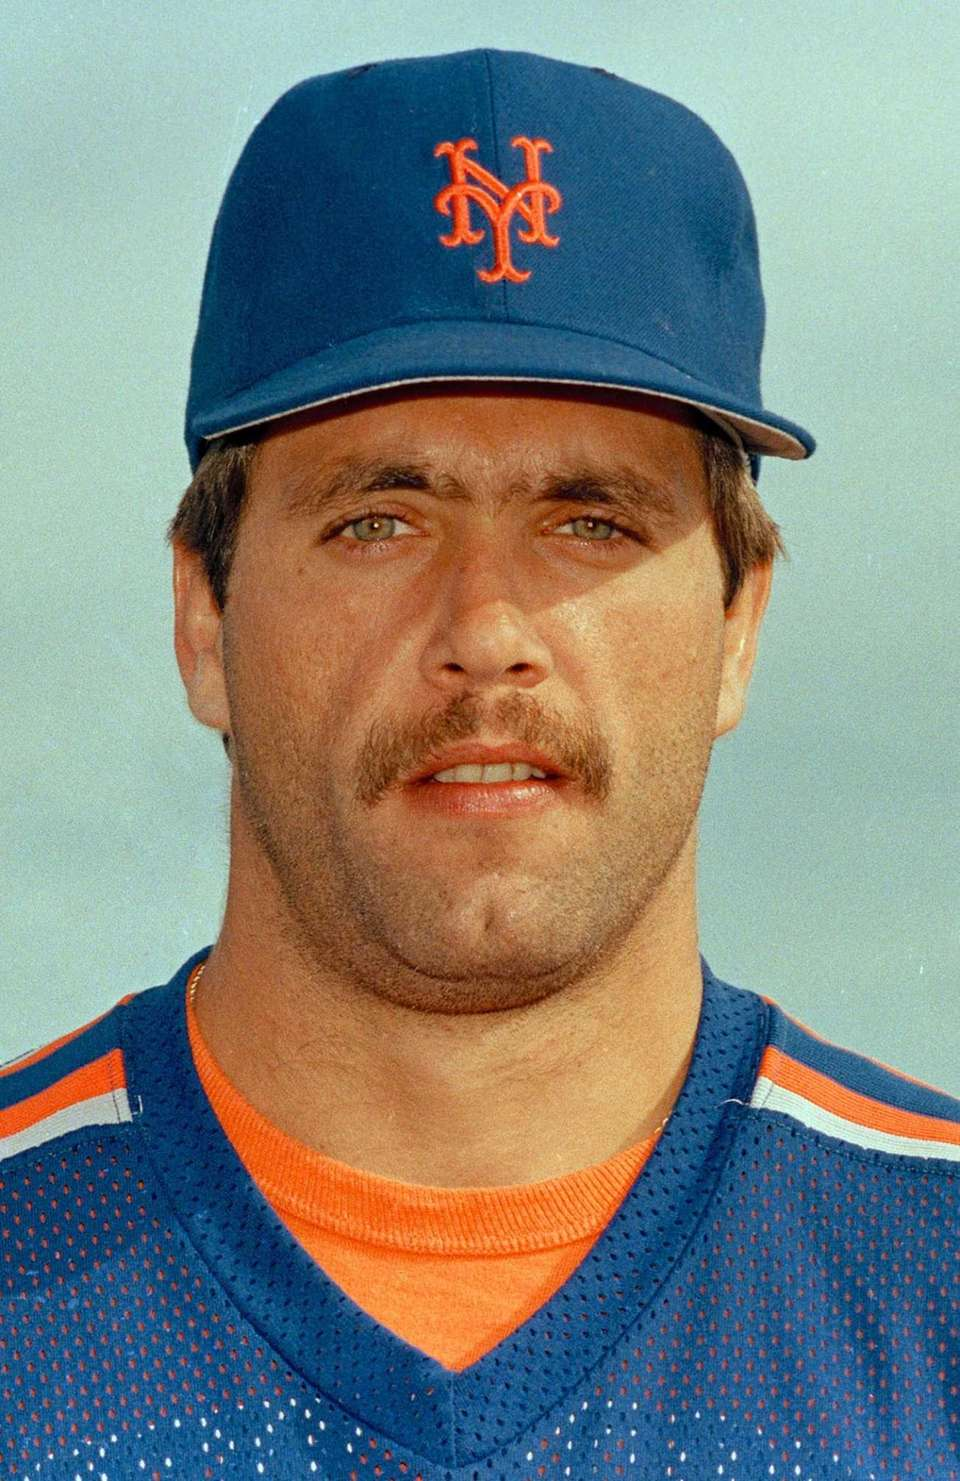 Backman had a good World Series, batting .333.